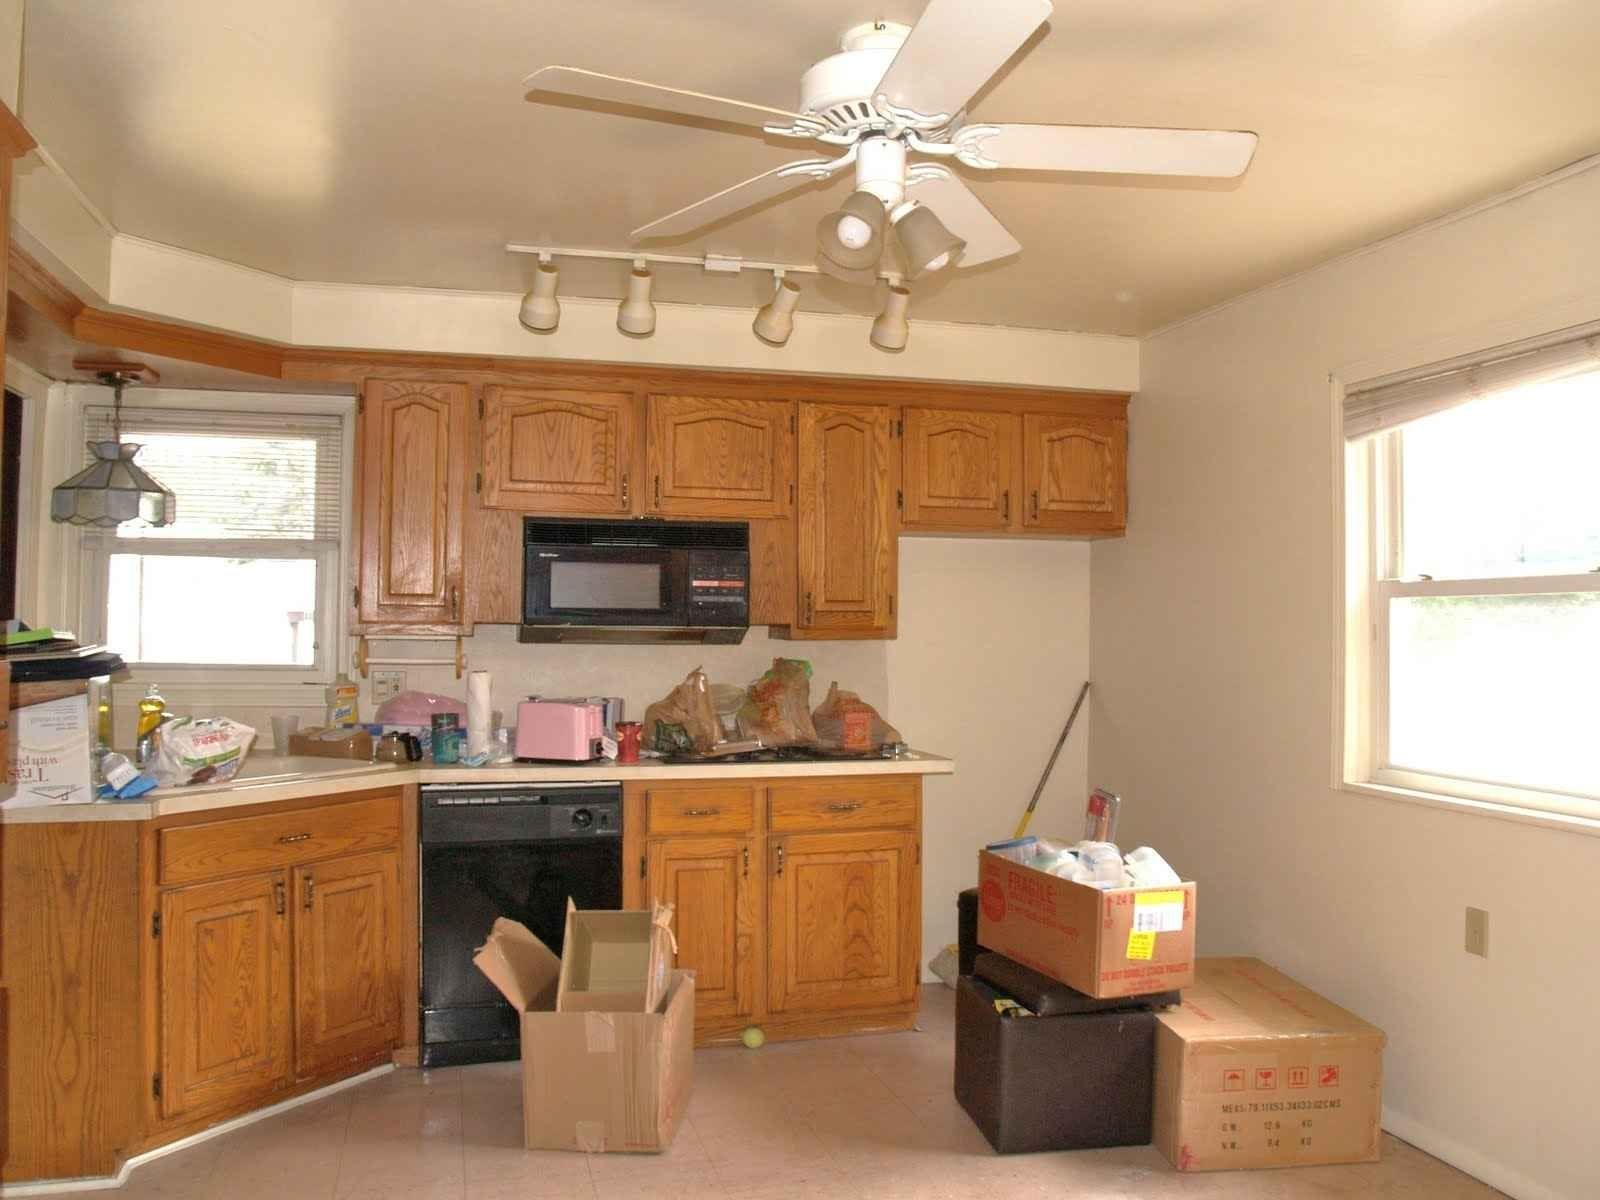 Best ceiling fans for kitchens ladysrofo pinterest